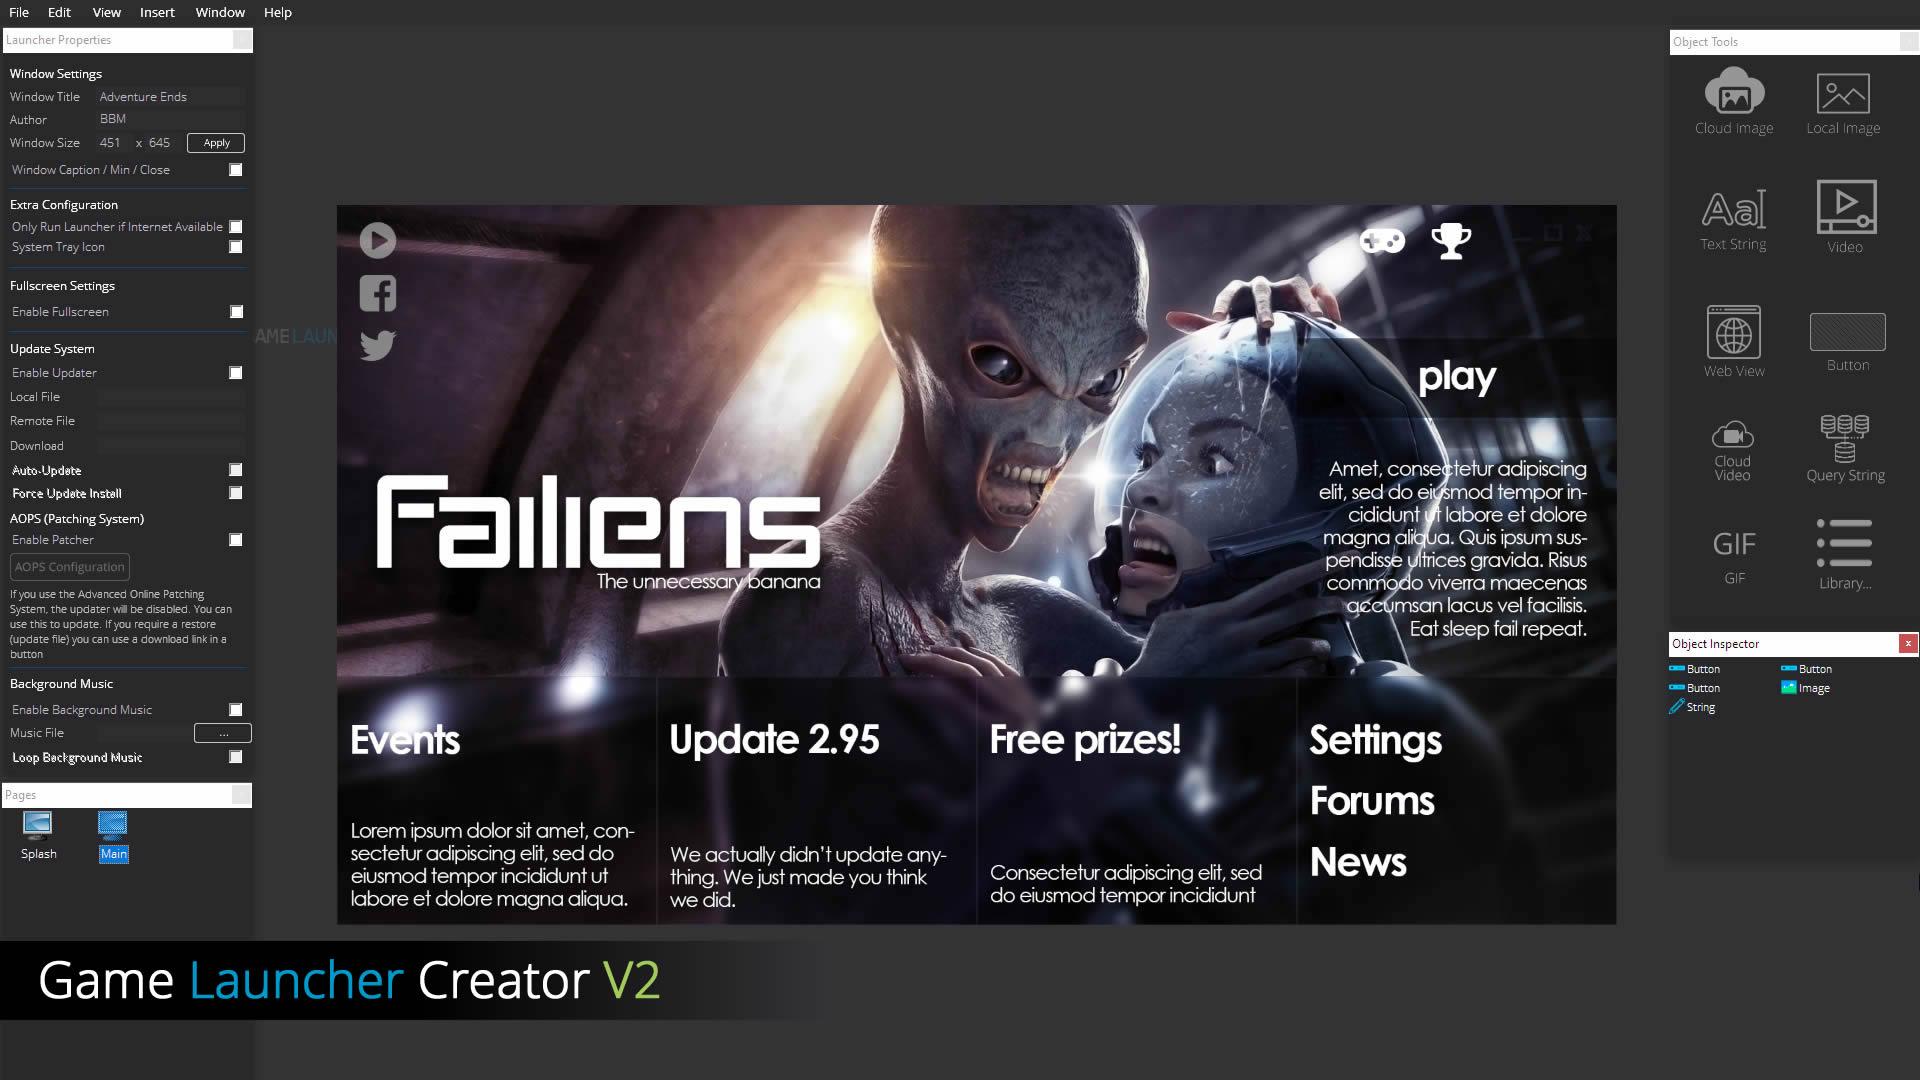 Game Launcher Creator V2 Standard Pro Editions Official Thread Gameguru Forum